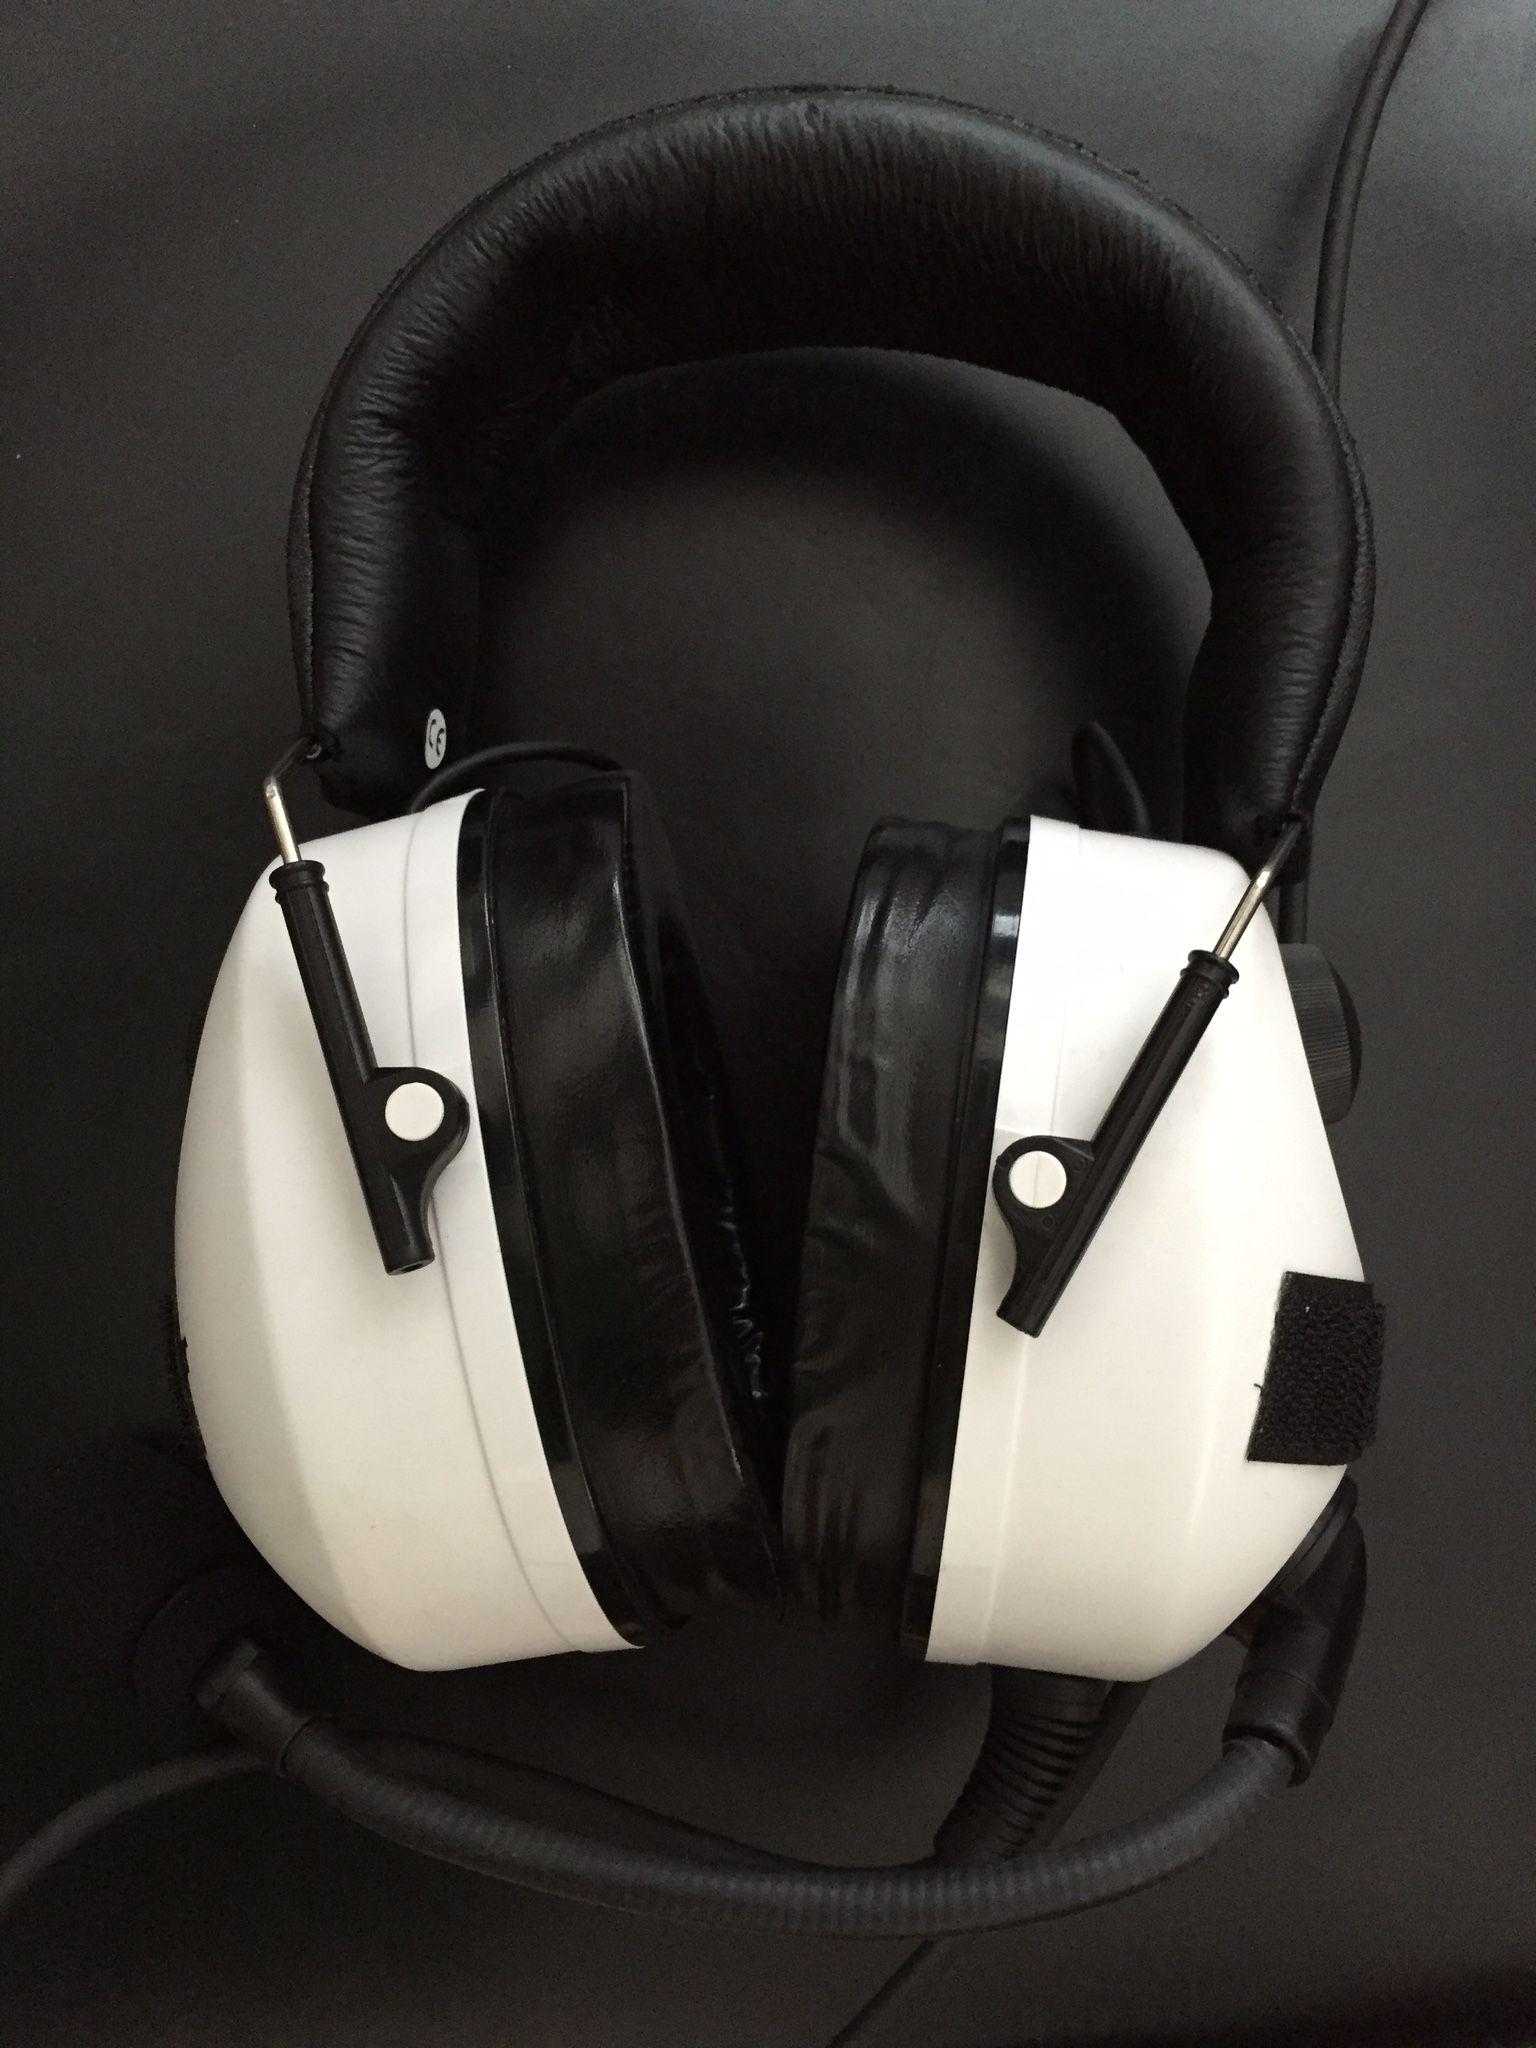 Aero-Star Headset